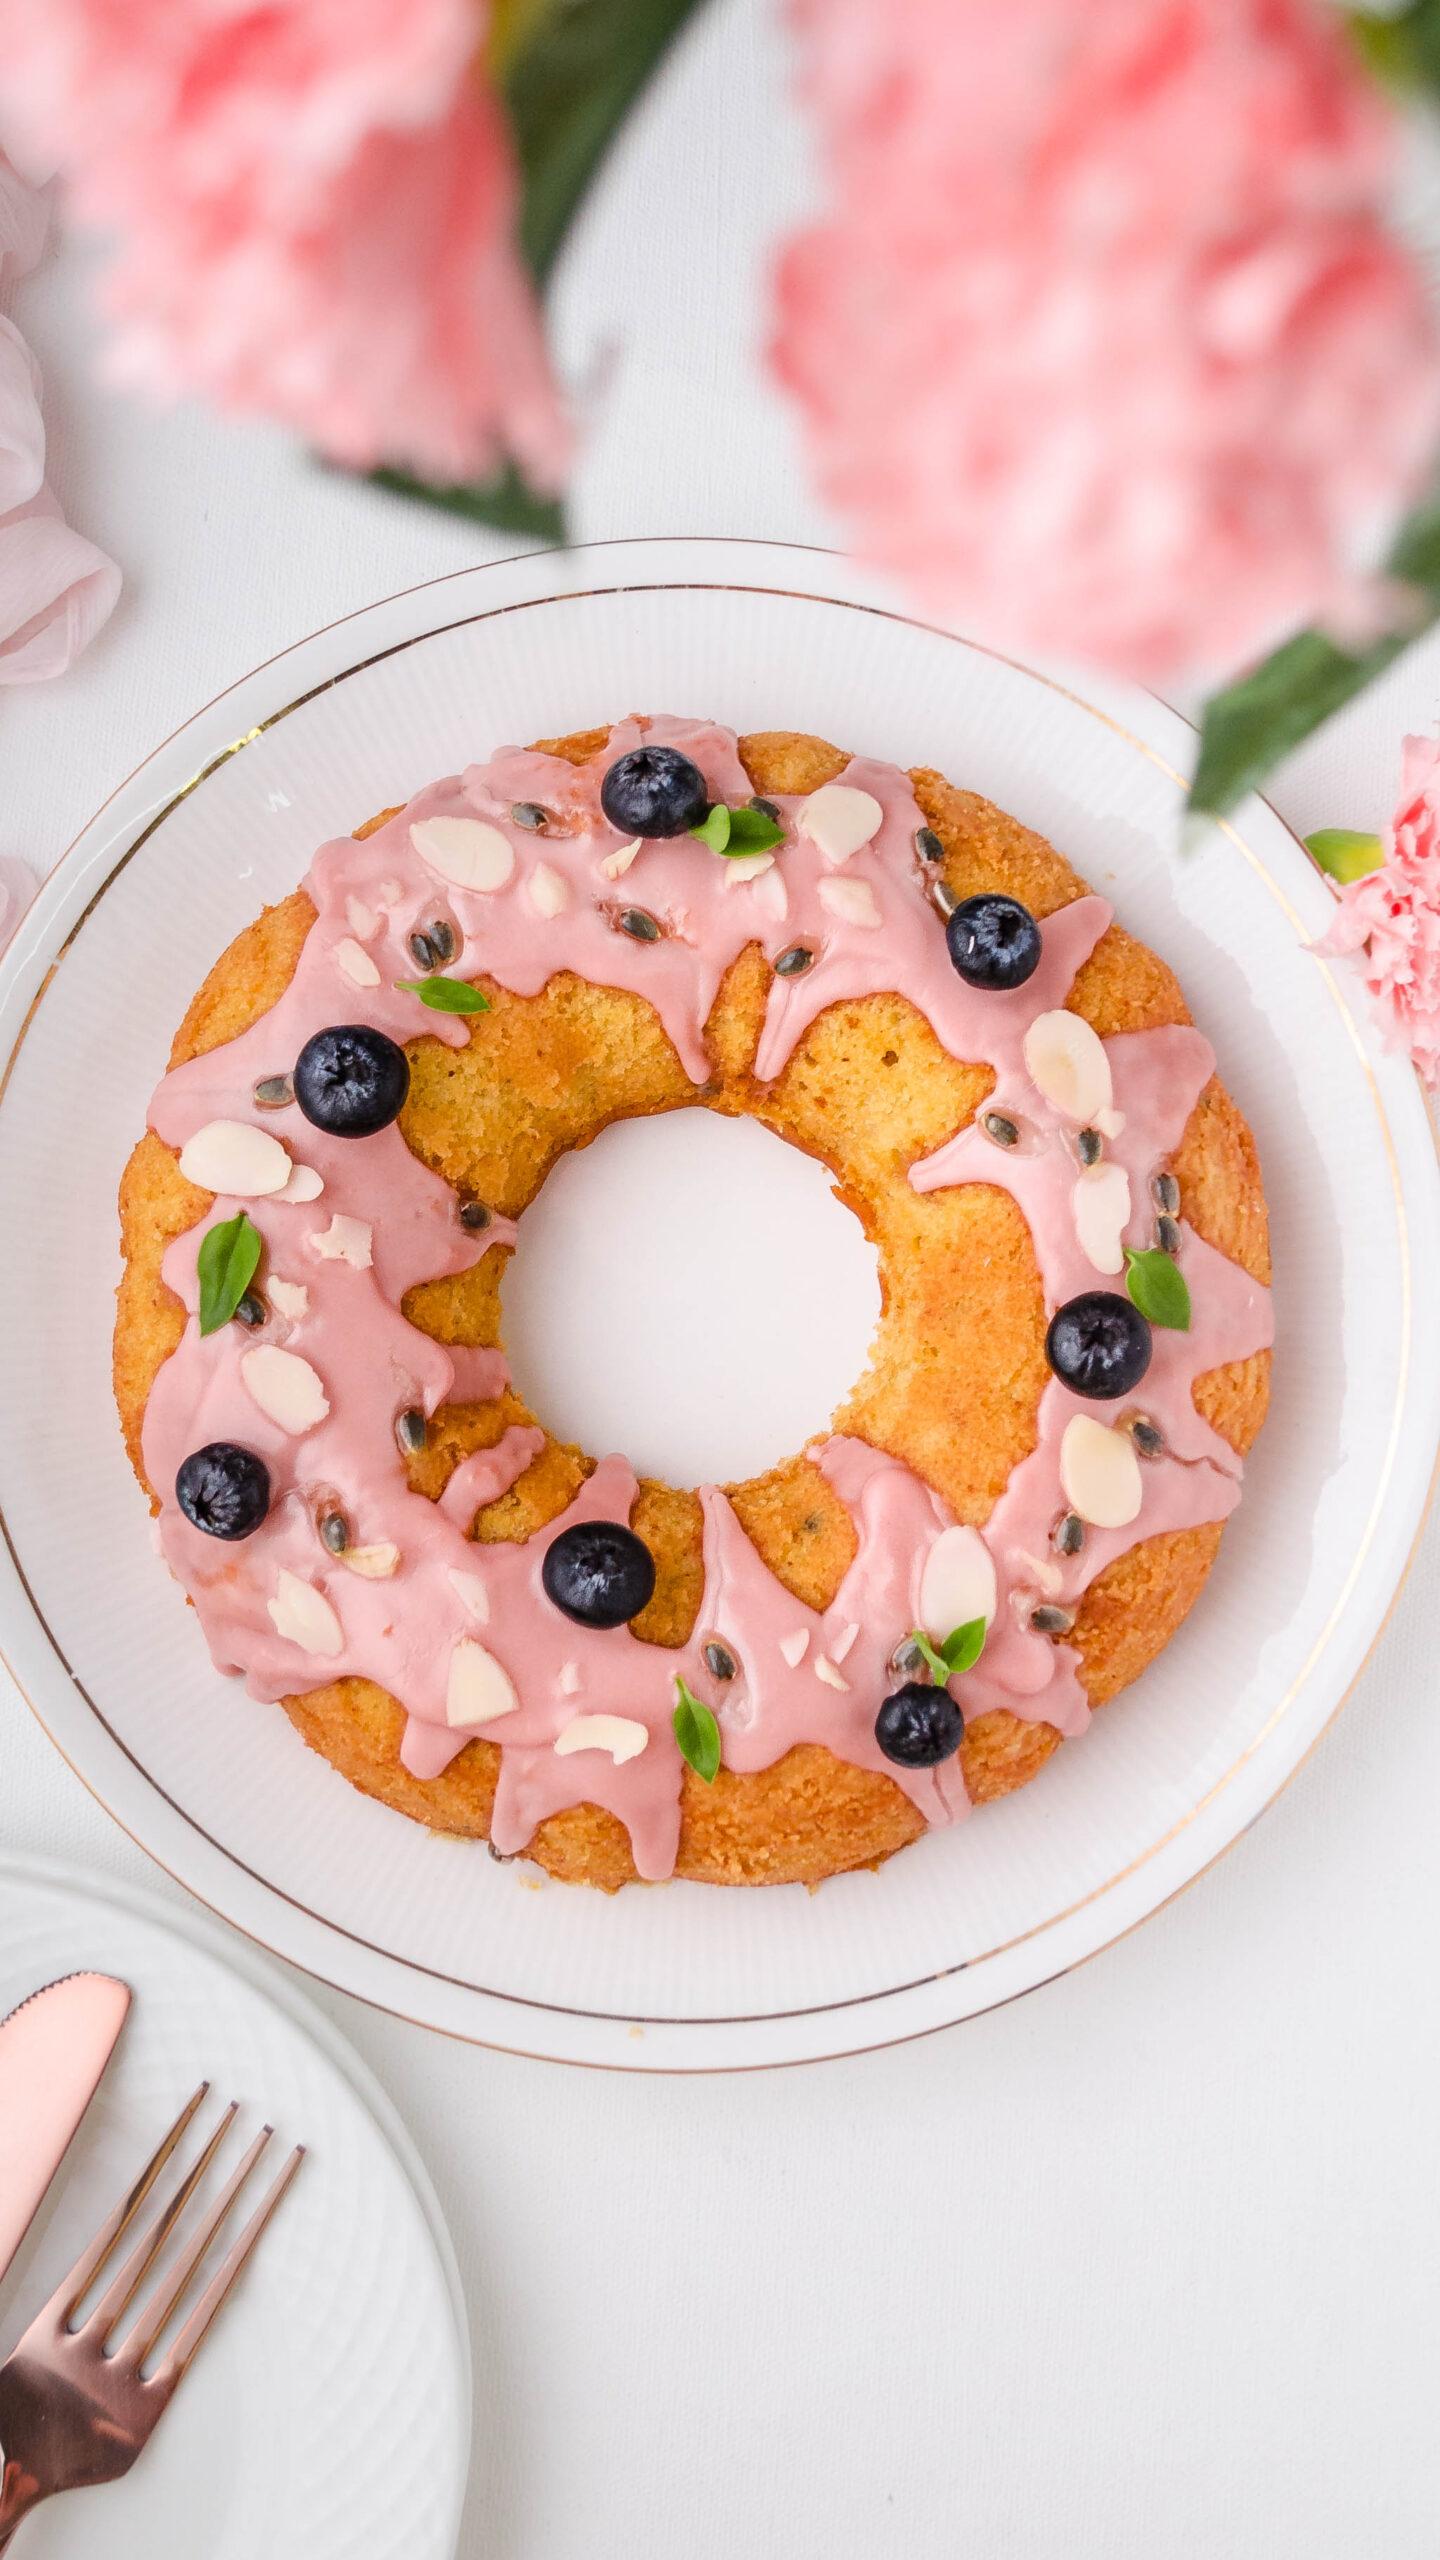 passion fruit orange cake, healthy recipe, healthy dessert, fruit dessert, easy cake recipe